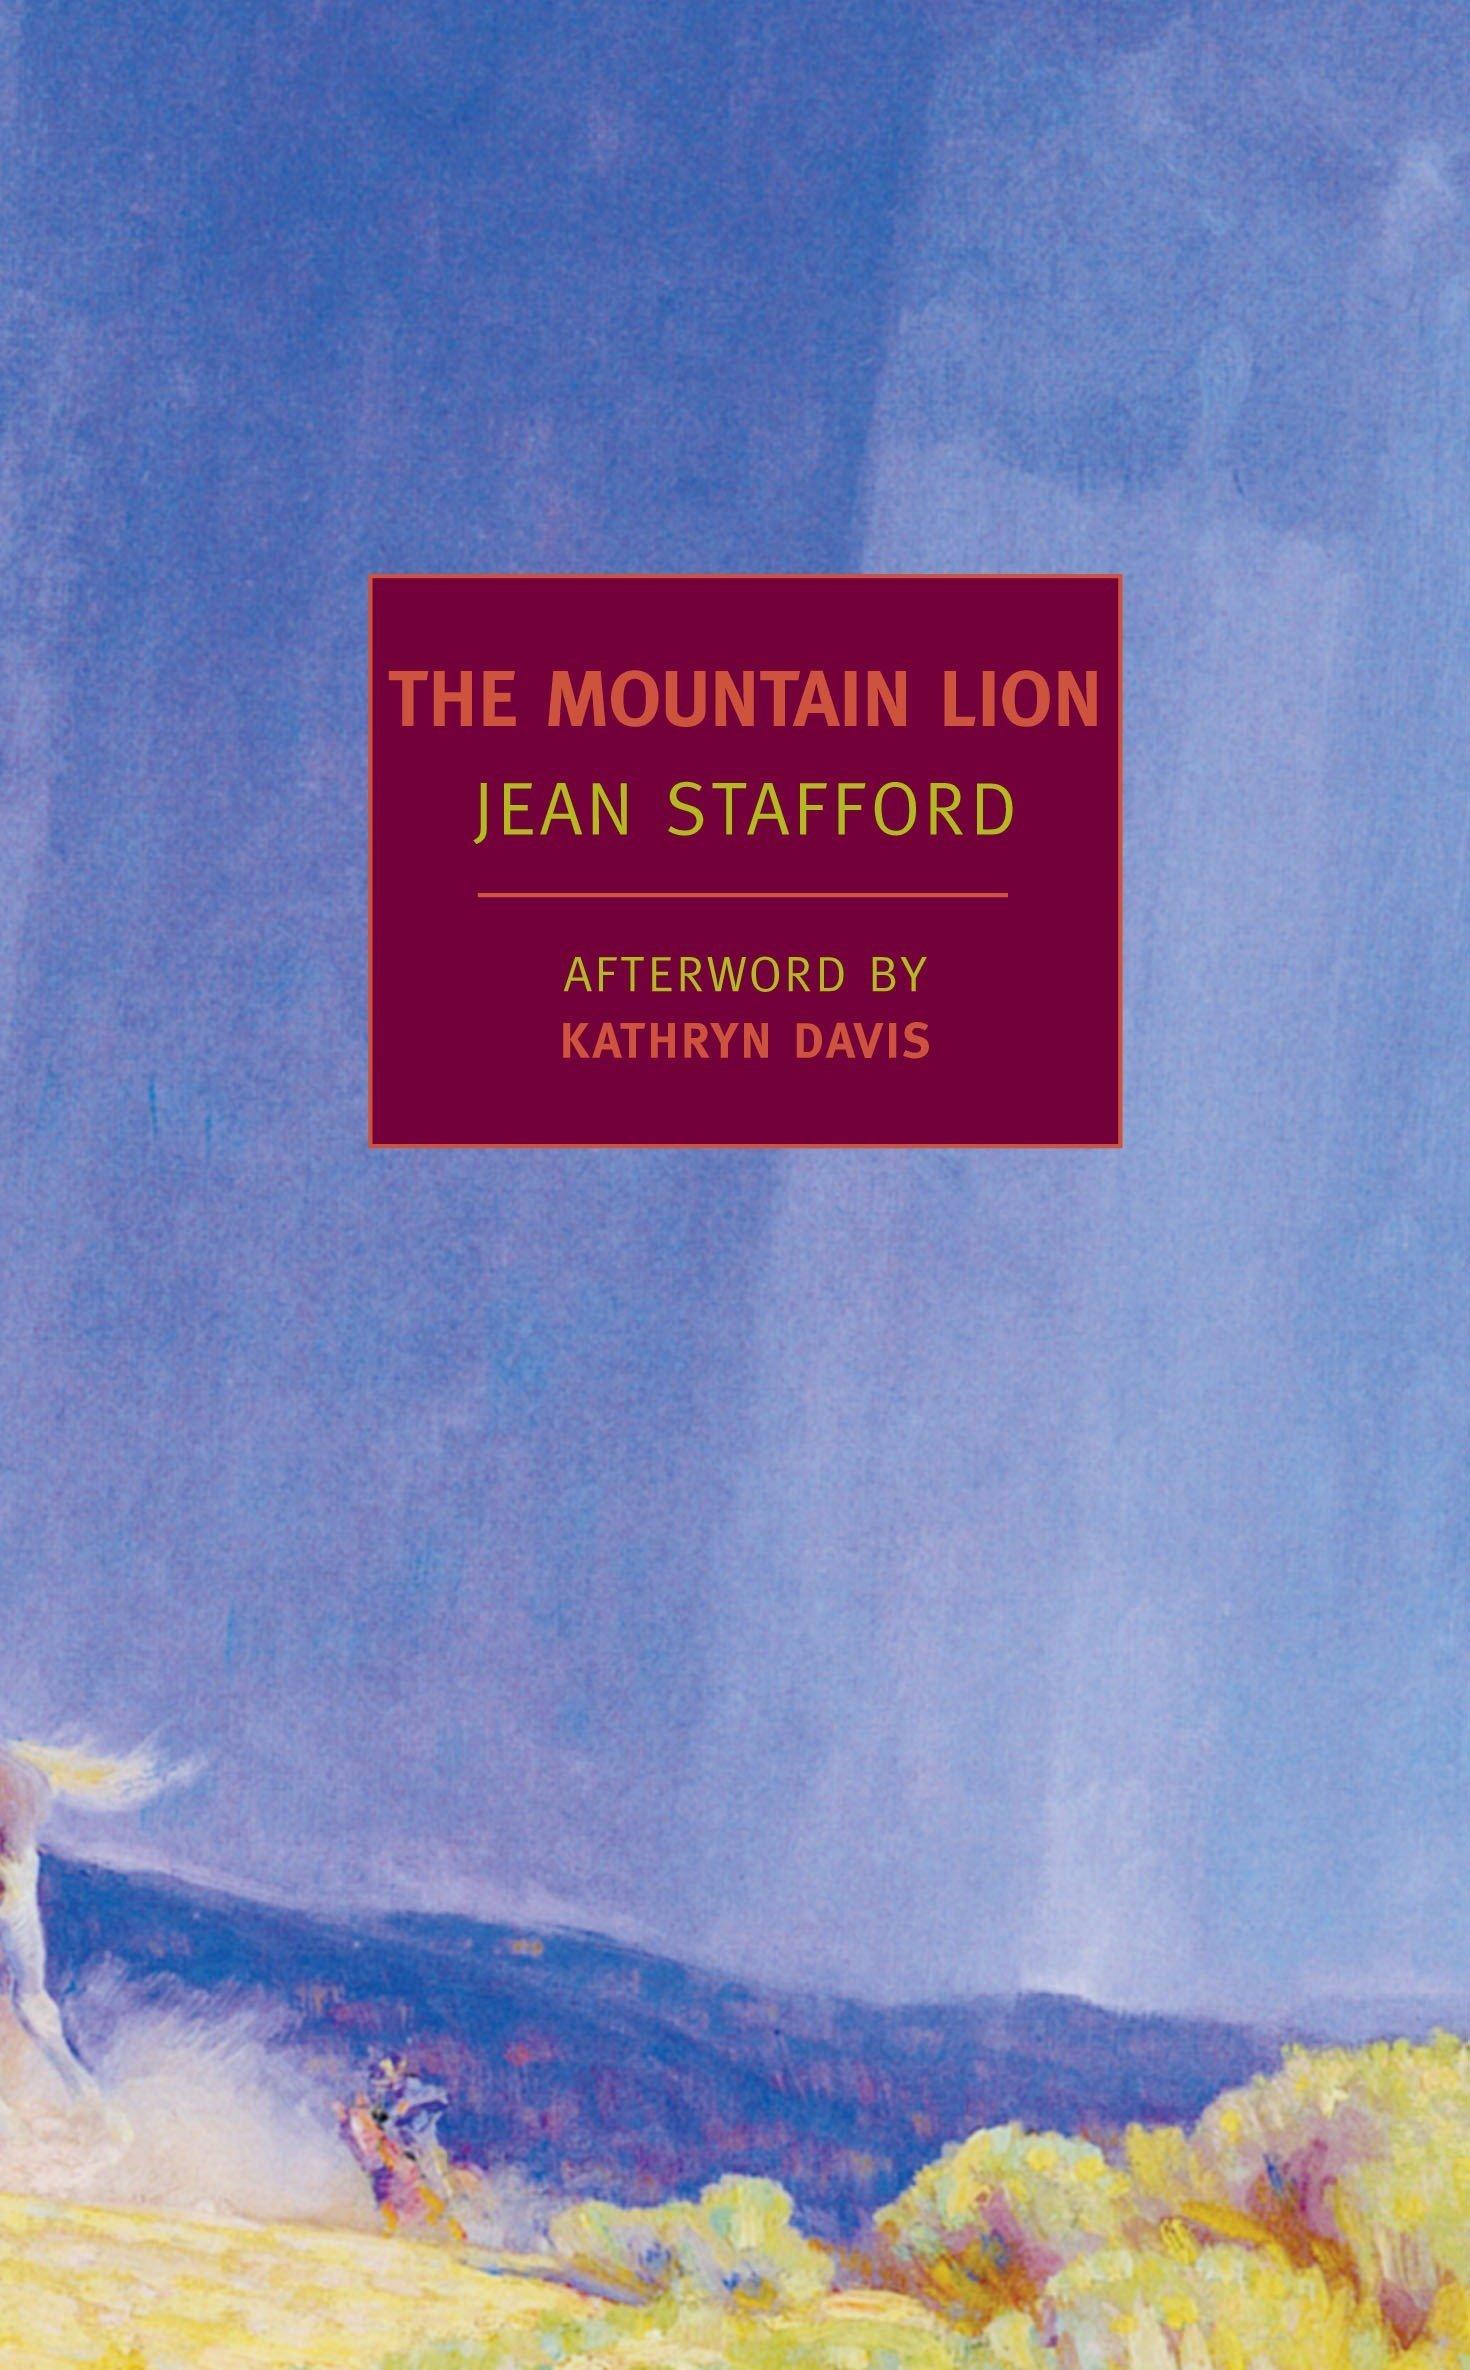 The Mountain Lion (New York Review Books Classics): Stafford, Jean, Davis,  Kathryn: 9781590173527: Amazon.com: Books